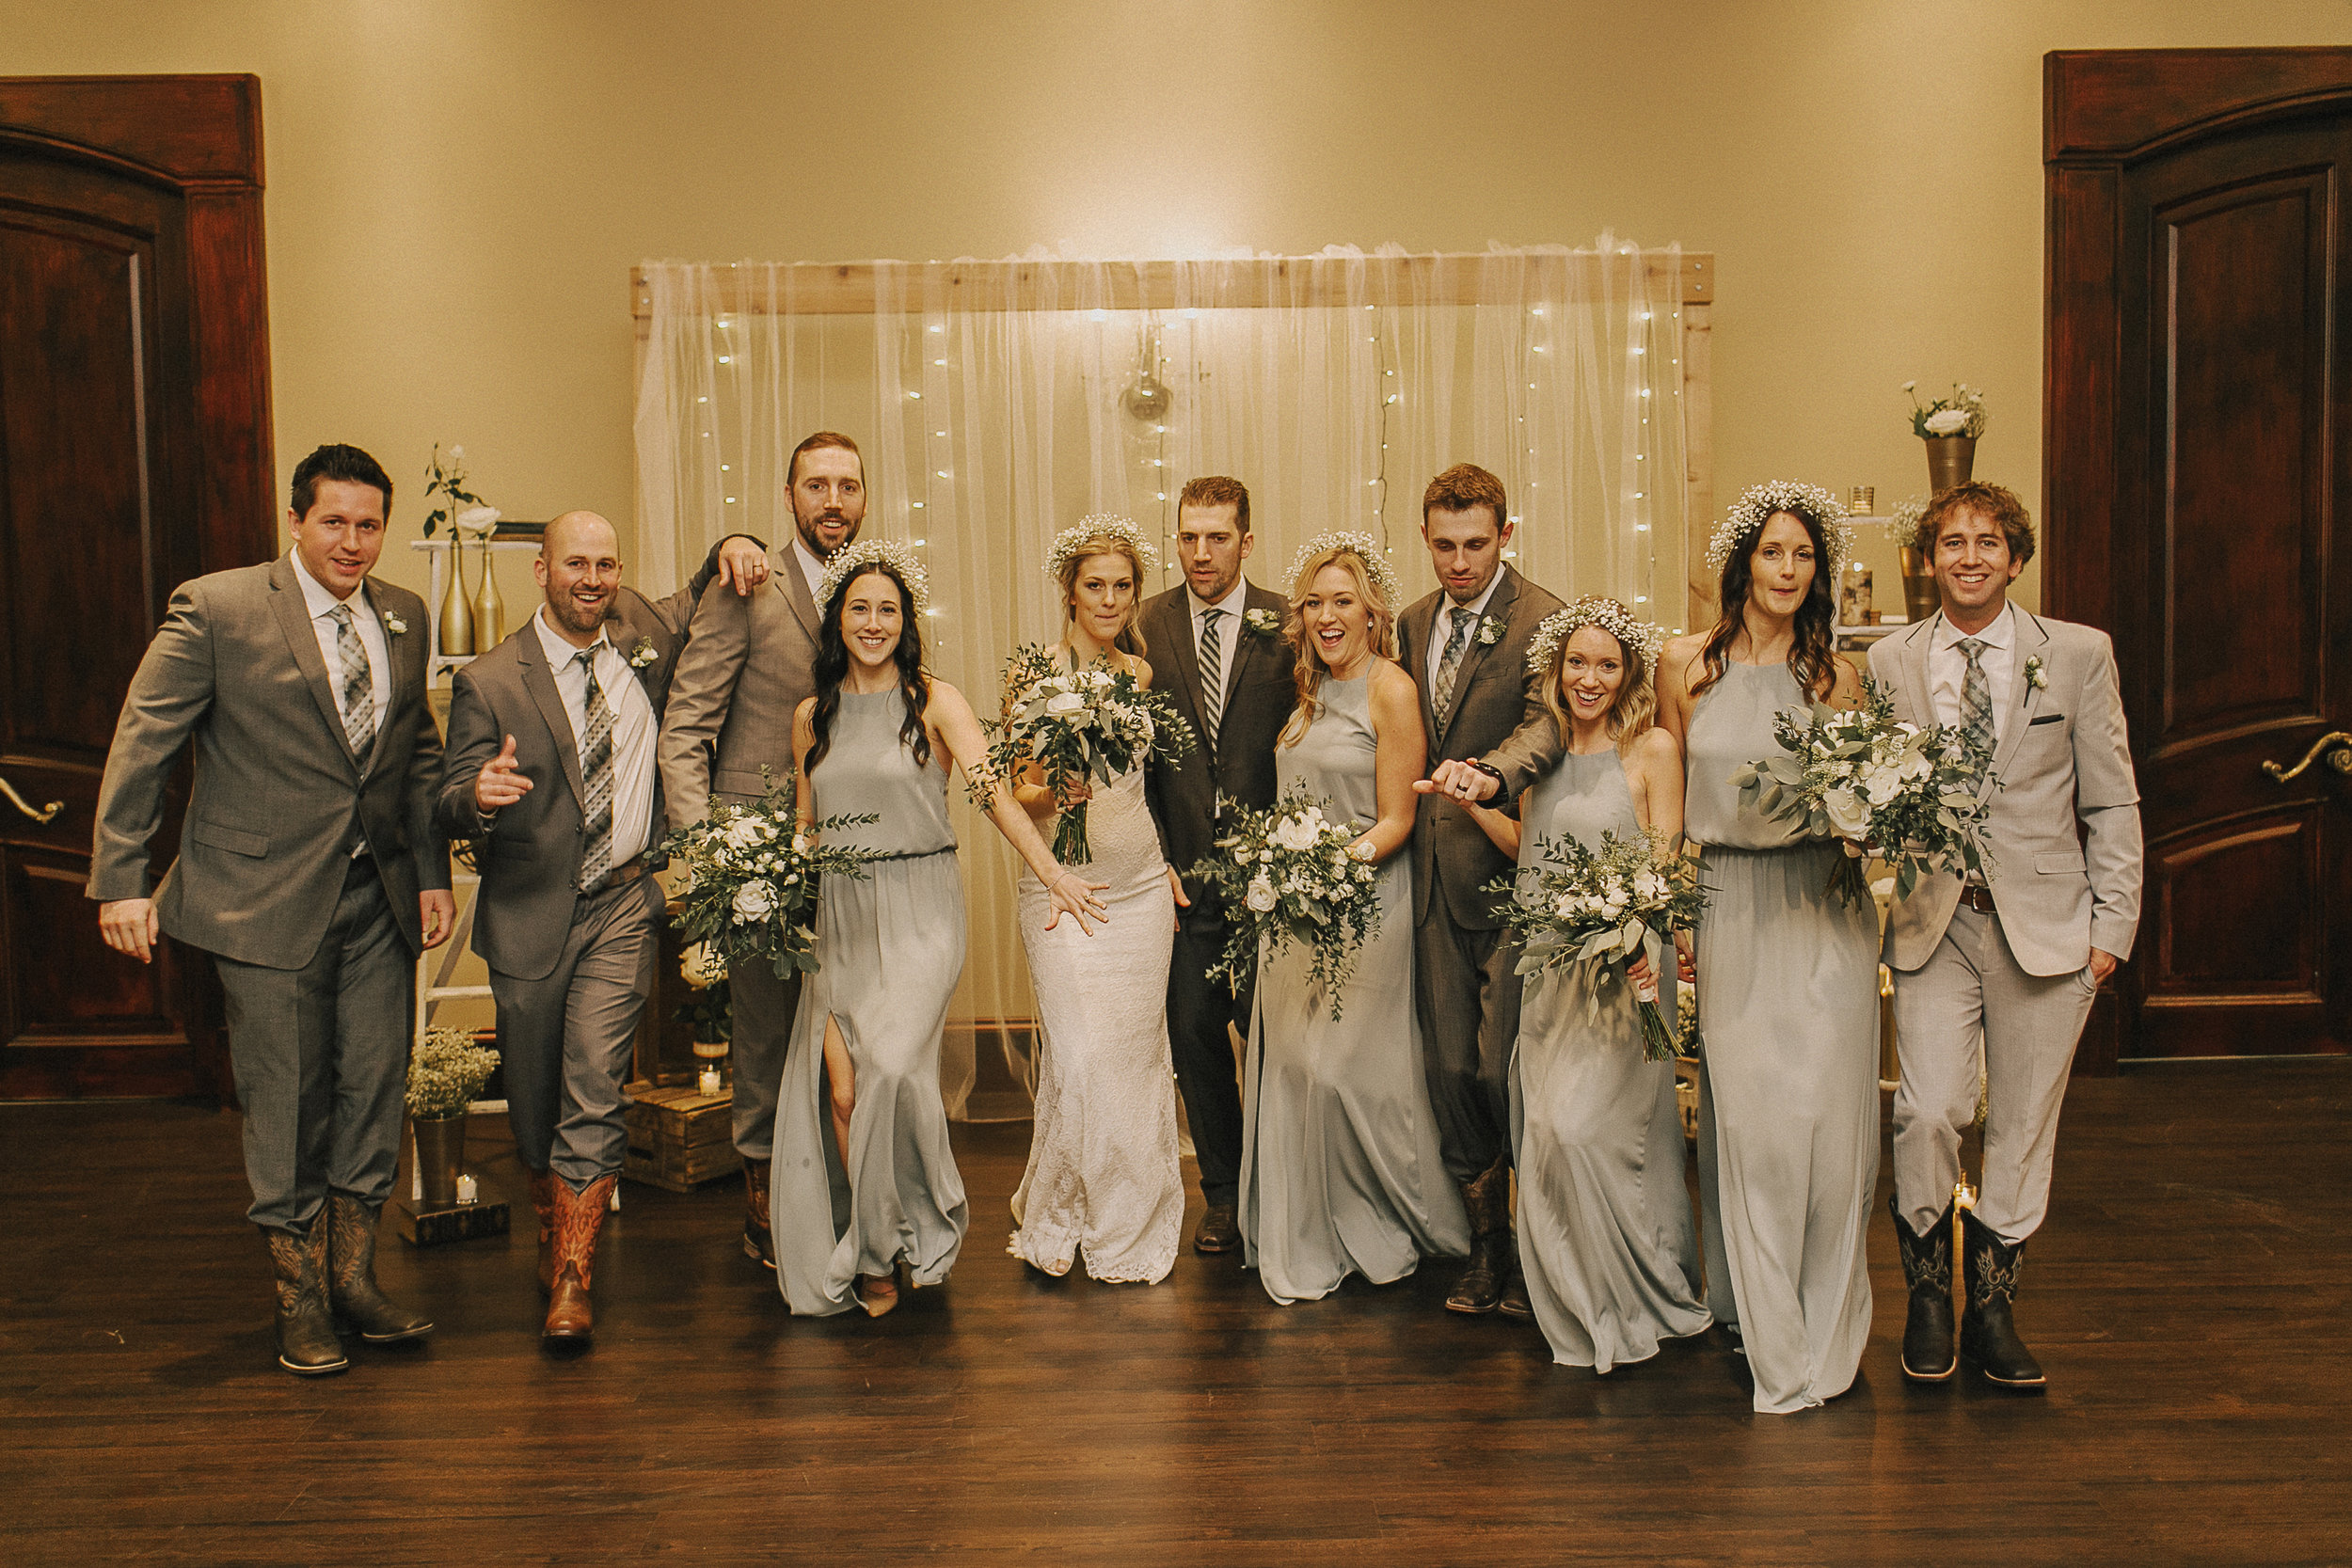 mark-and-liz-wedding-464.jpg